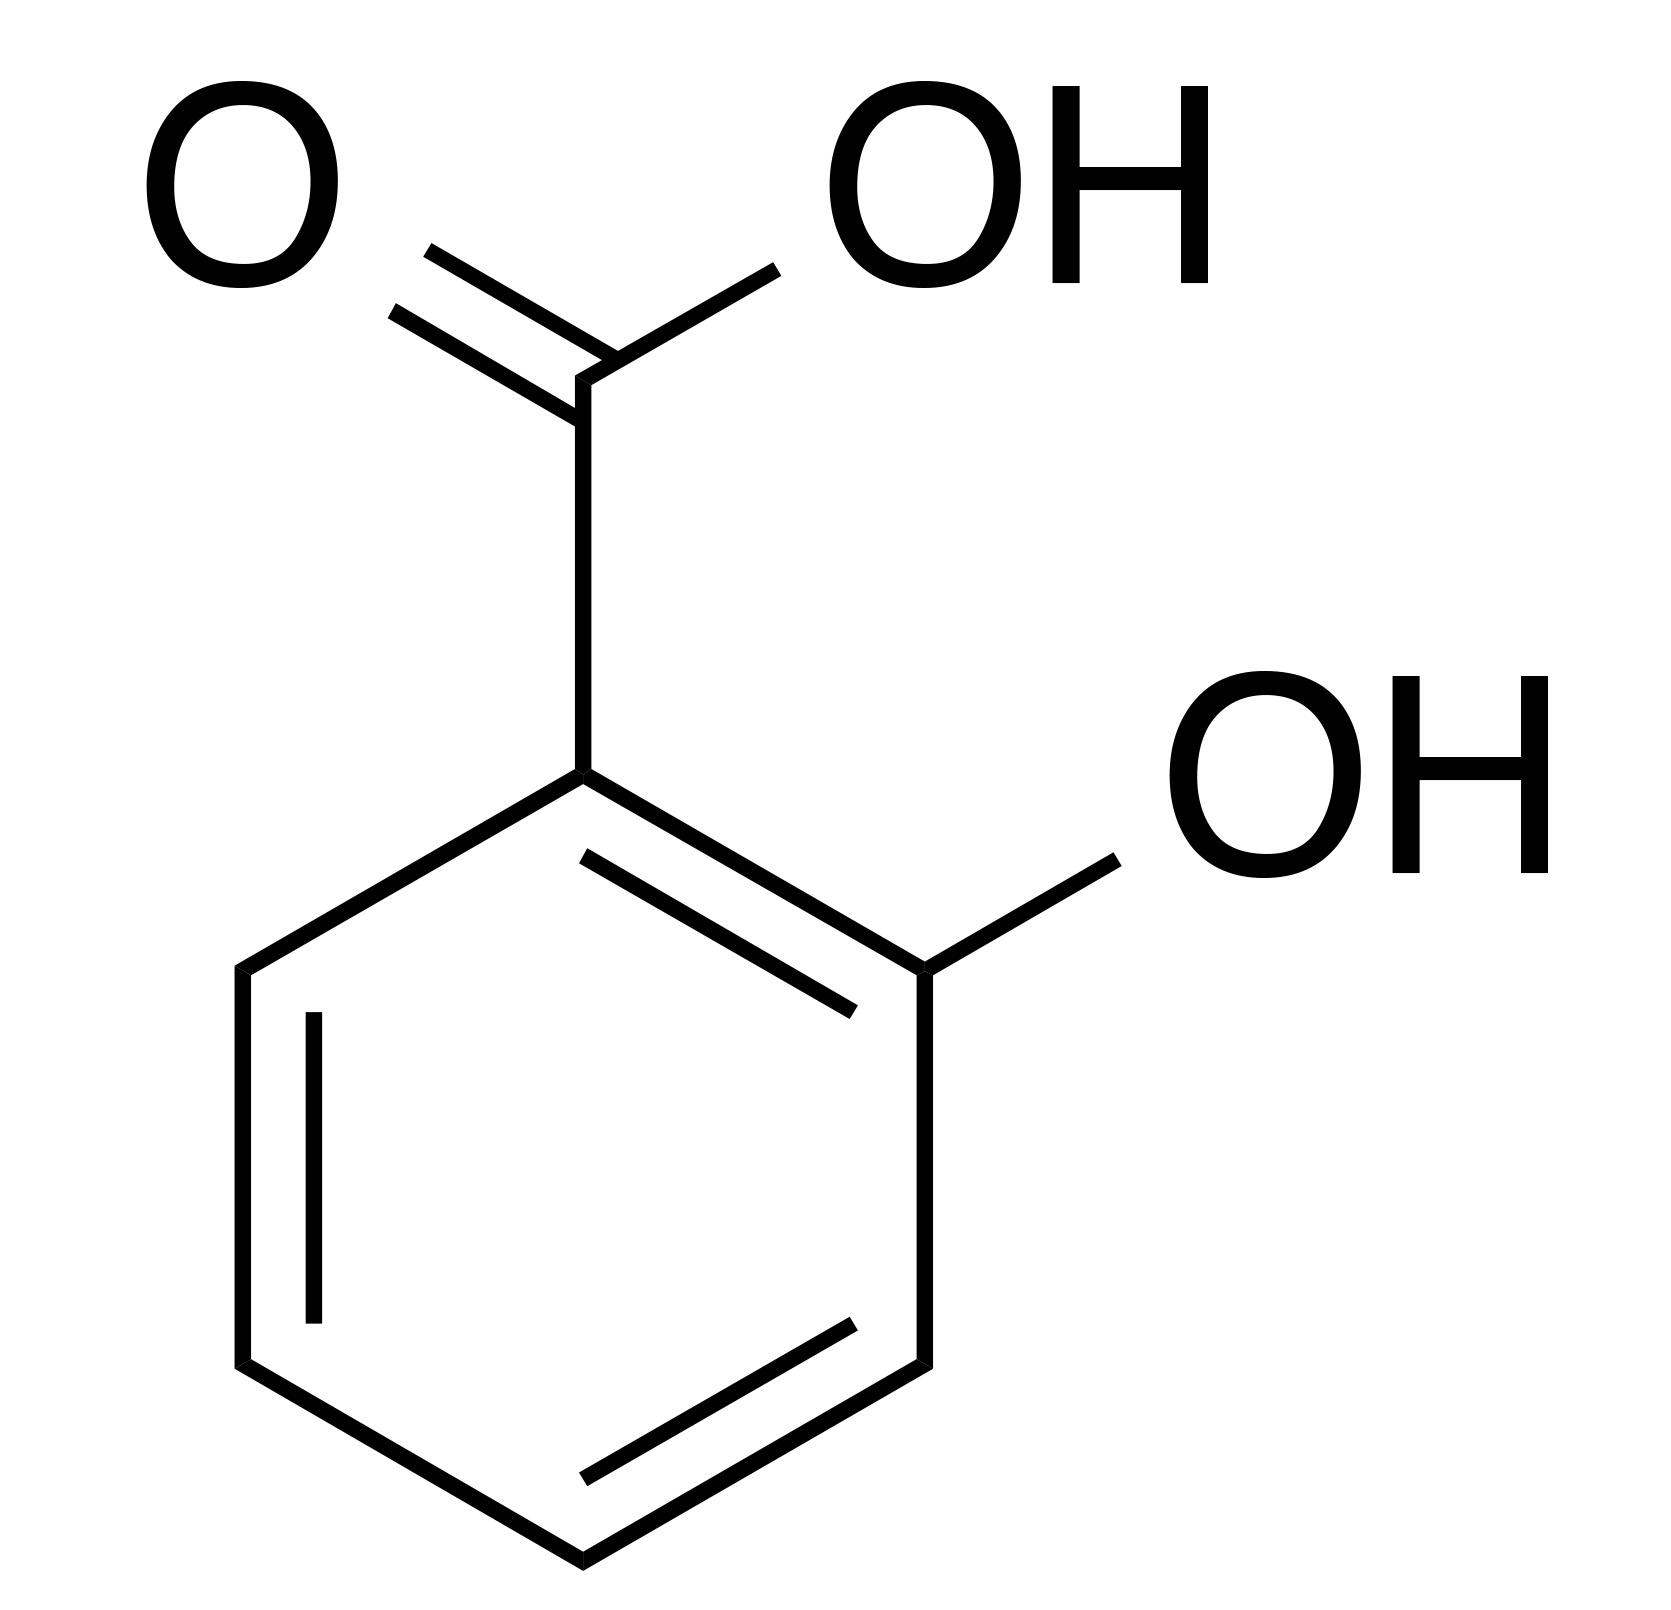 molecular structure of salicylic acid